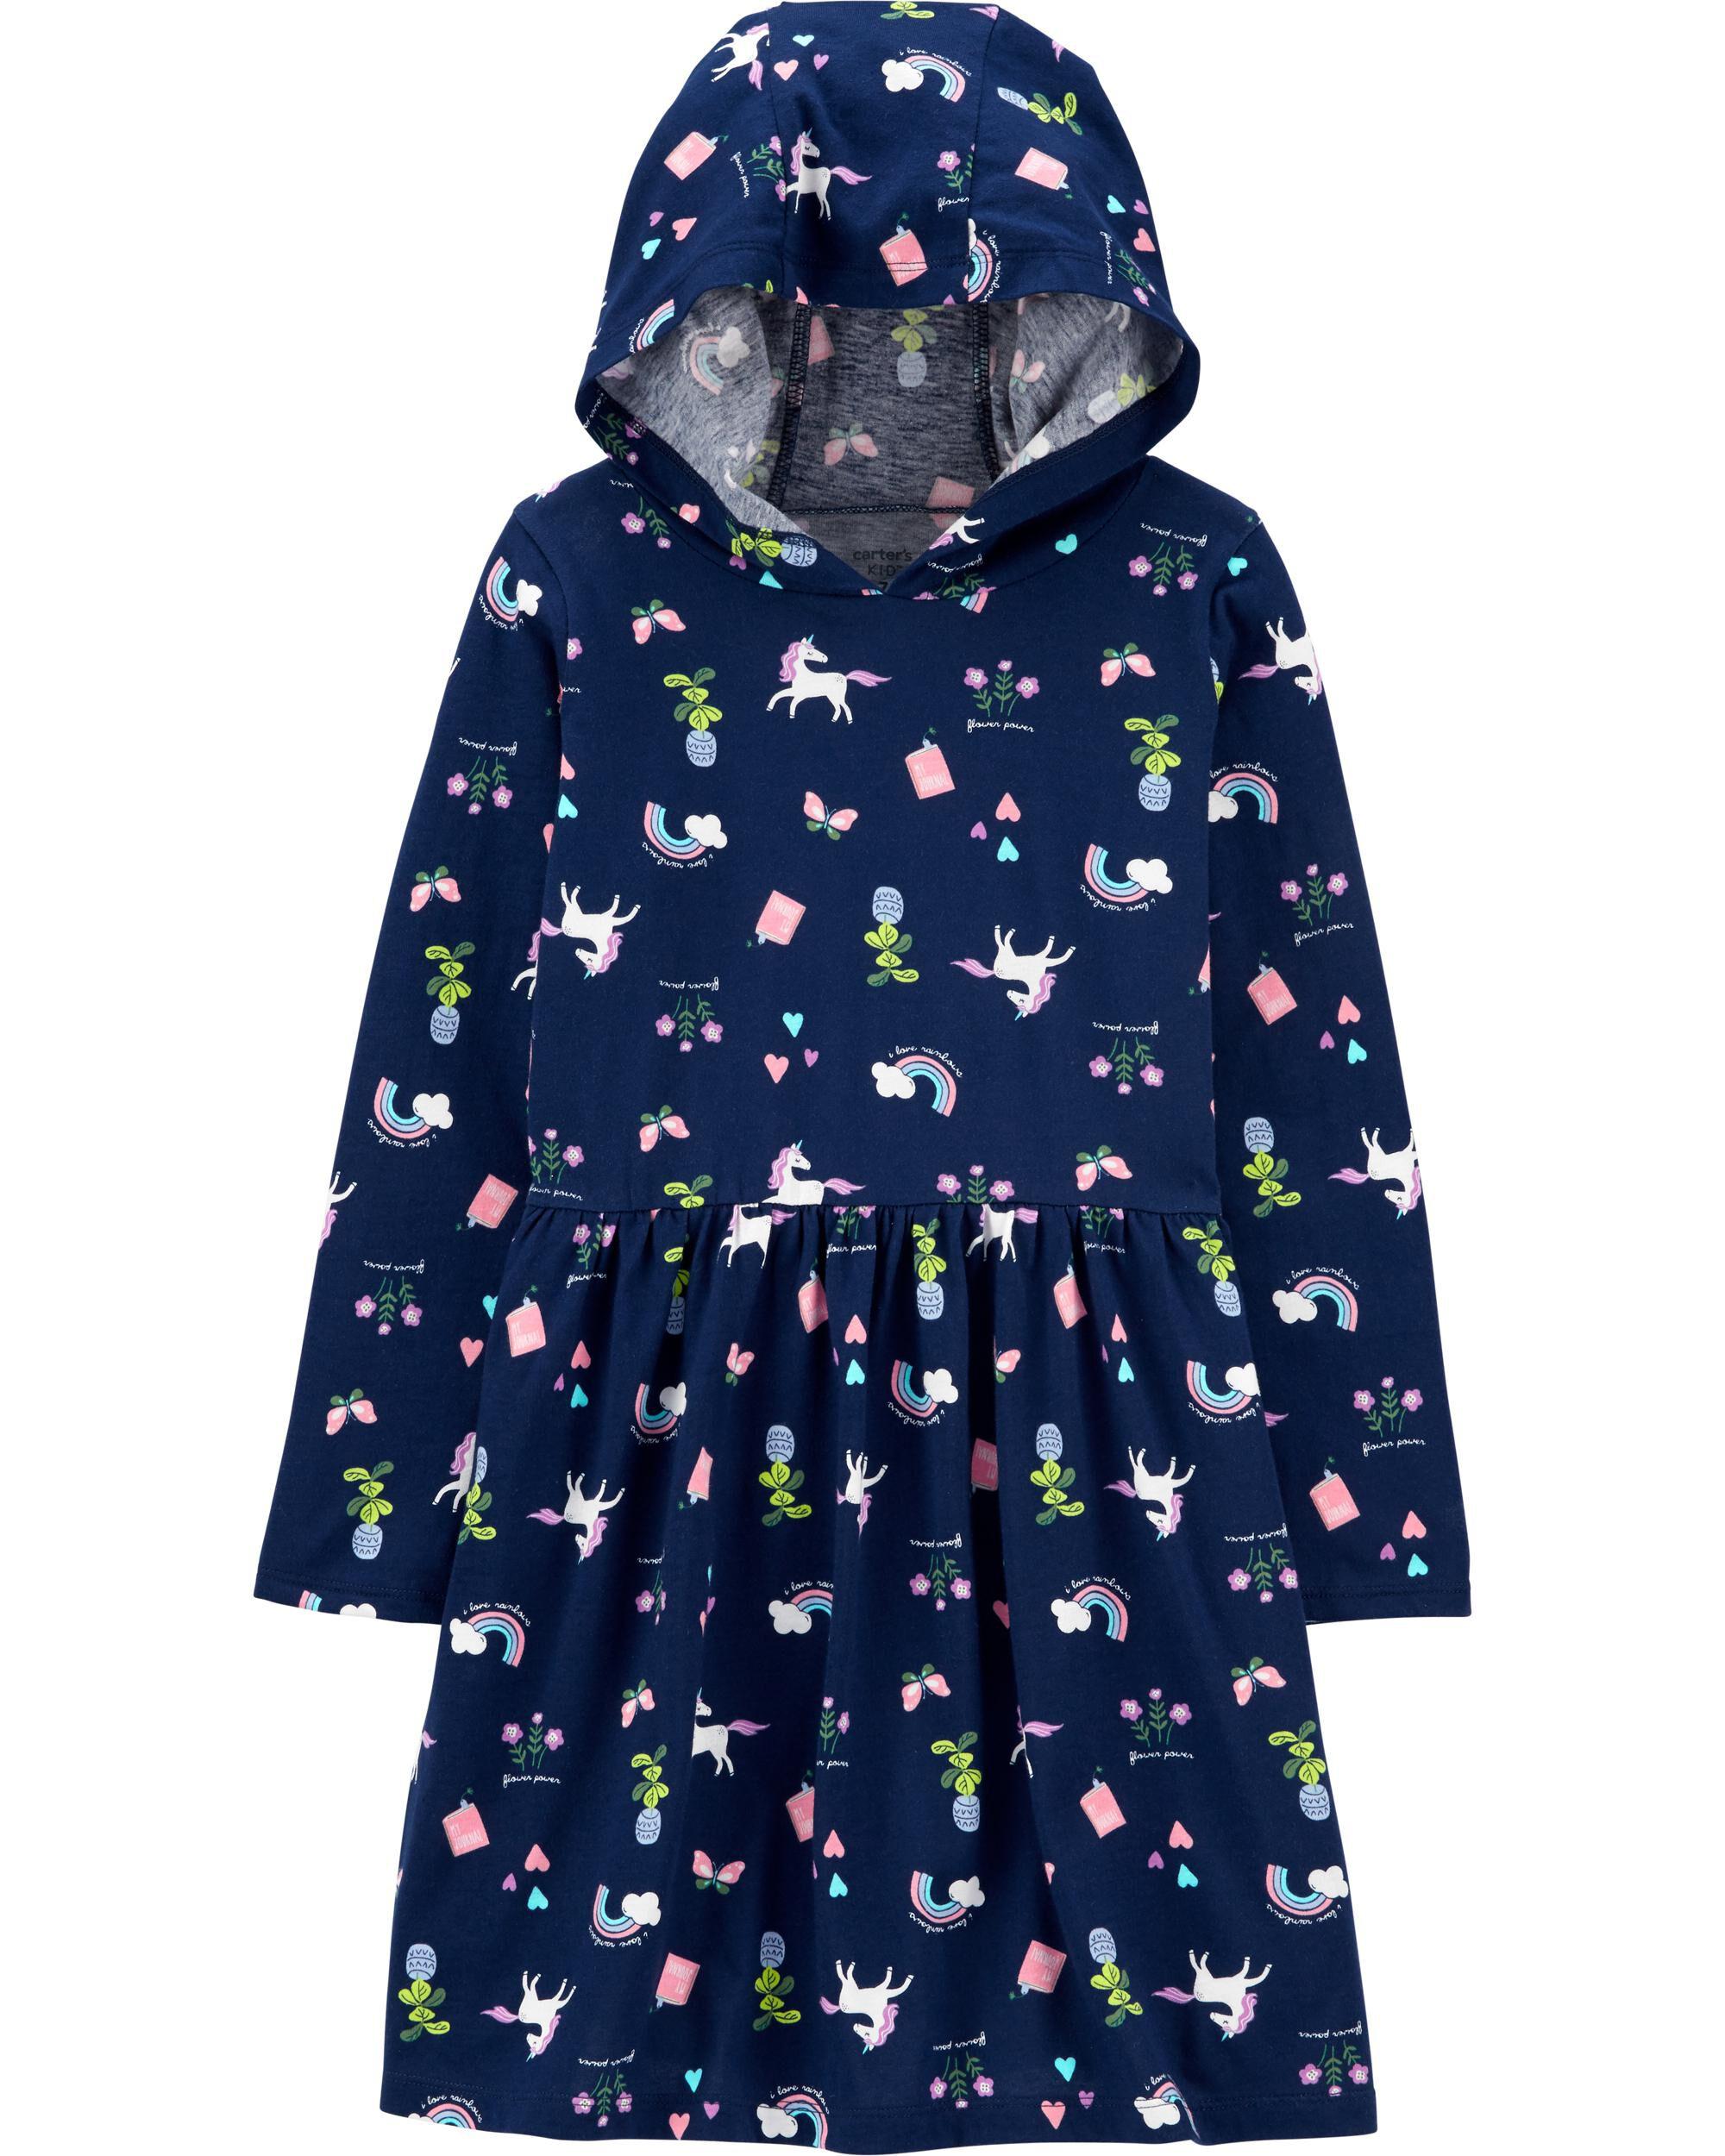 *Clearance*  Unicorn Hooded Jersey Dress